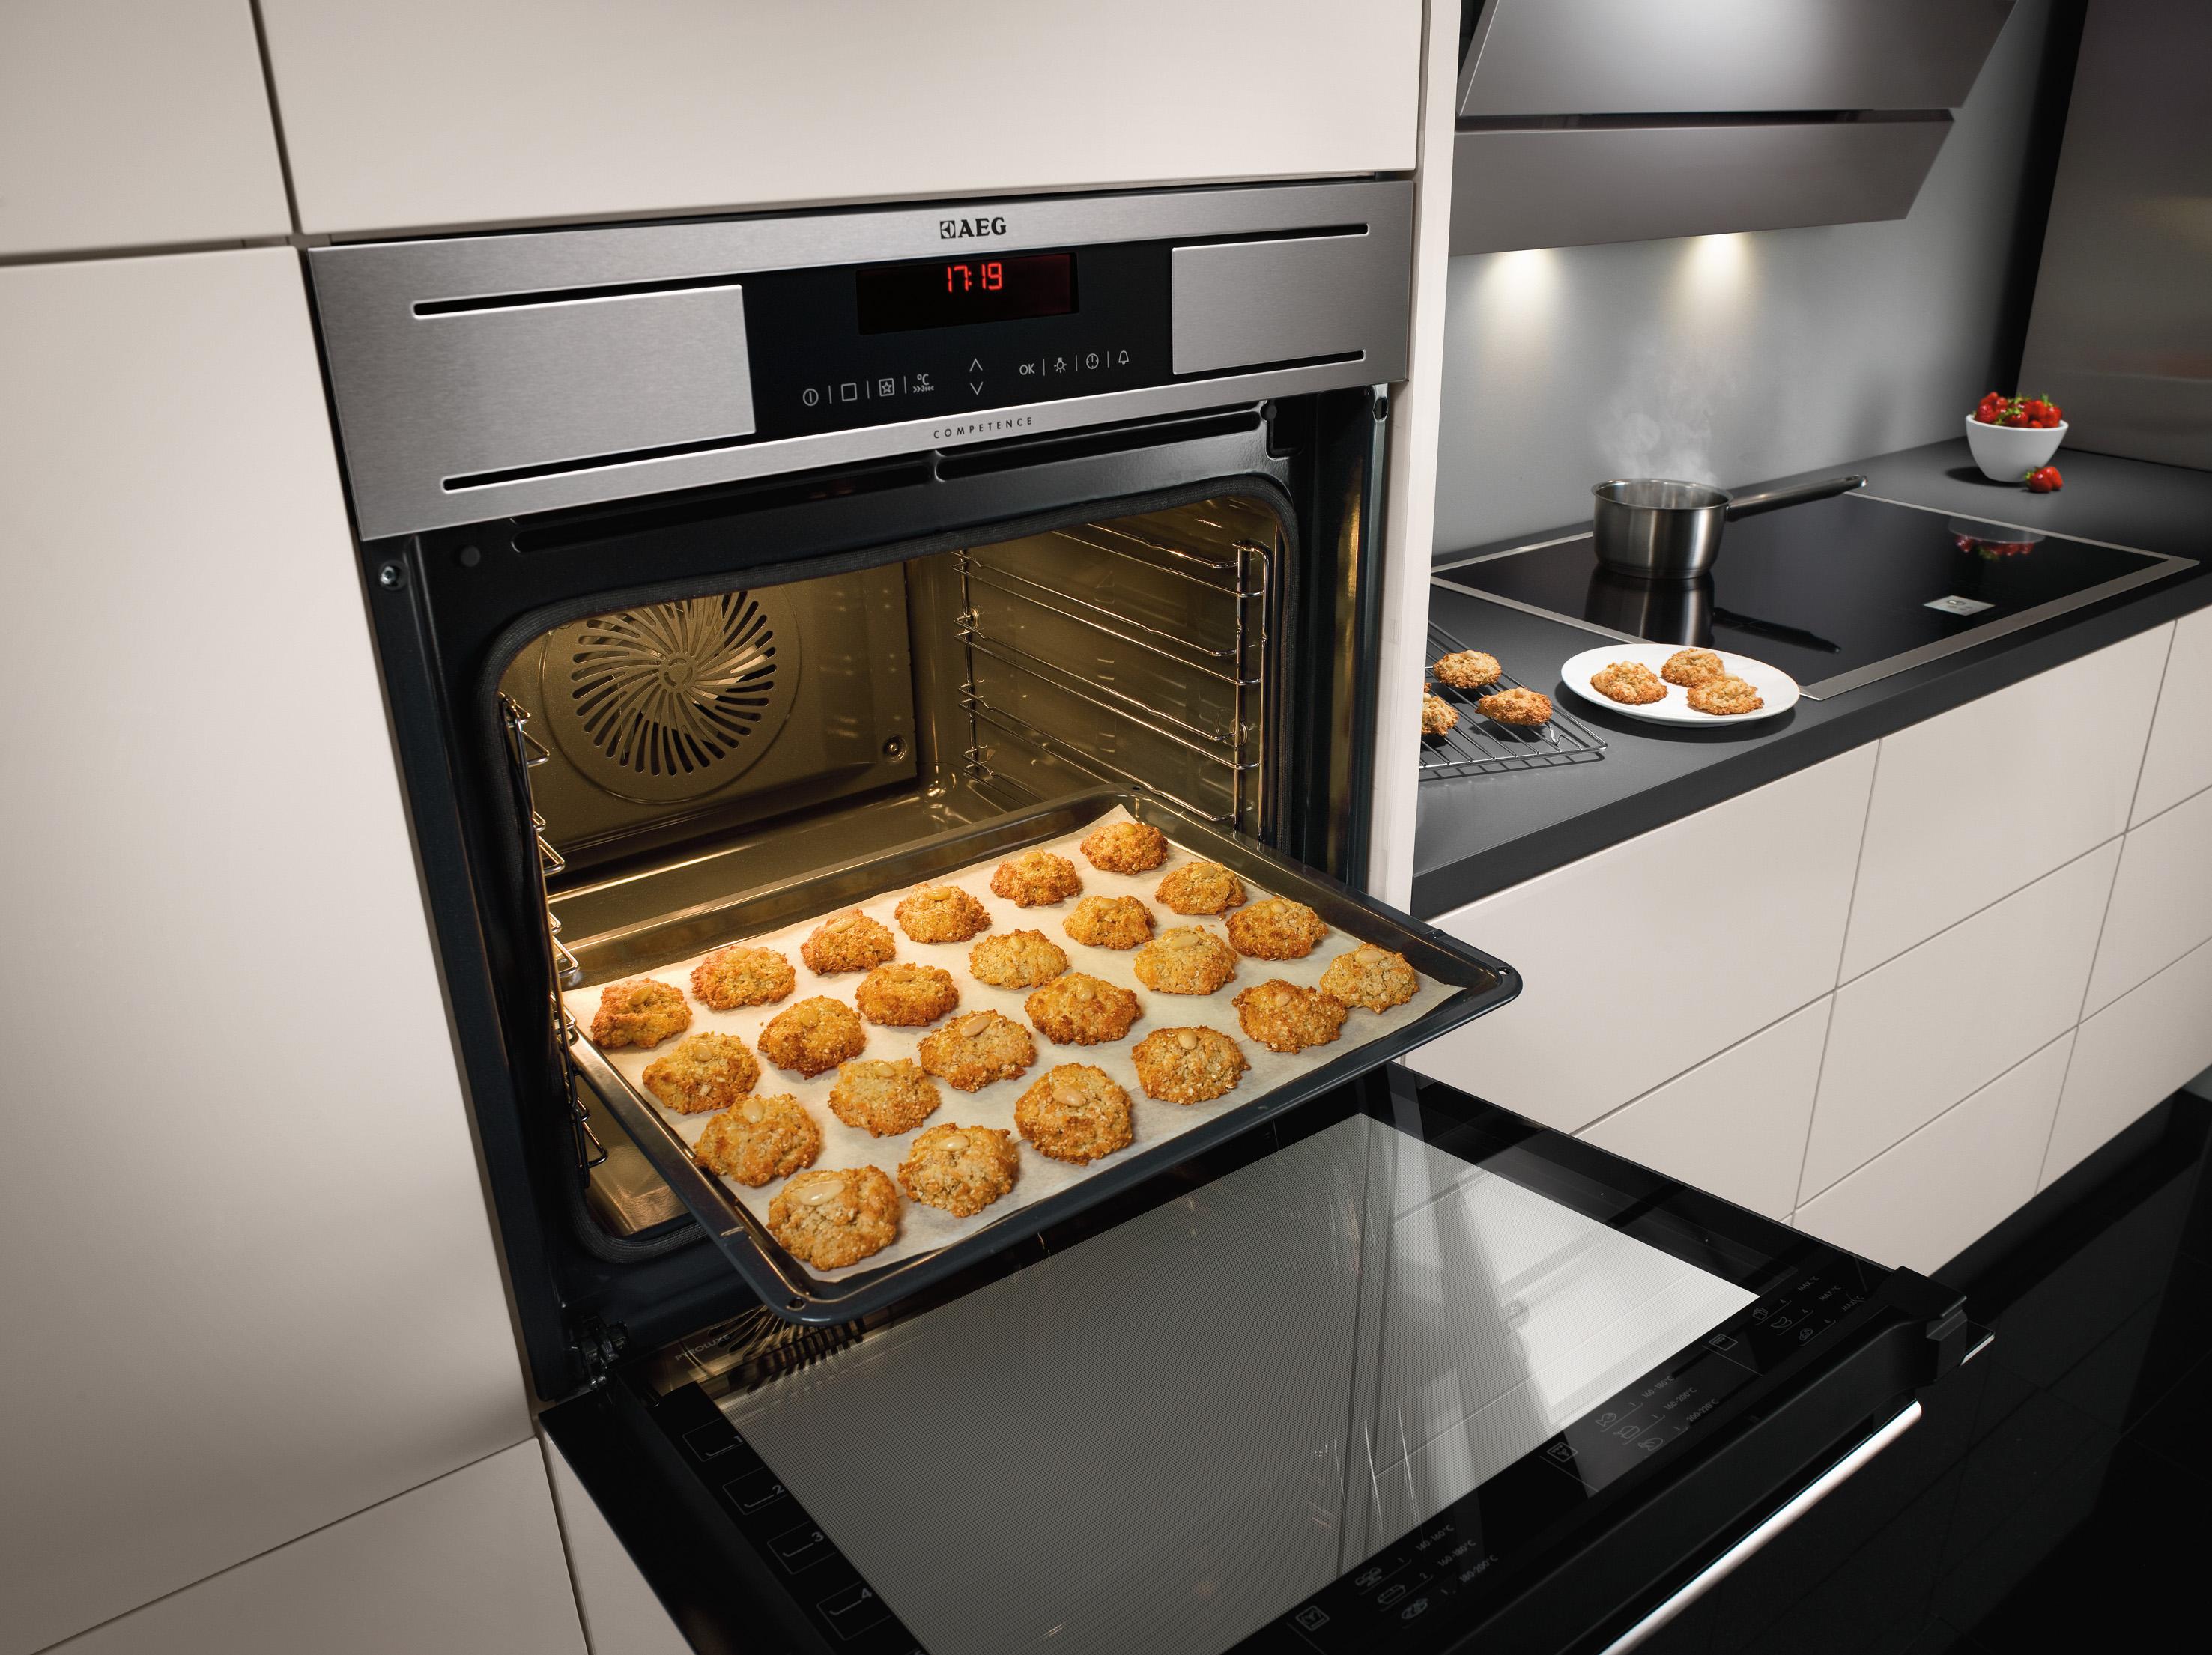 maxi klasse backofen oven von aeg 6 aeg maxiklasse. Black Bedroom Furniture Sets. Home Design Ideas